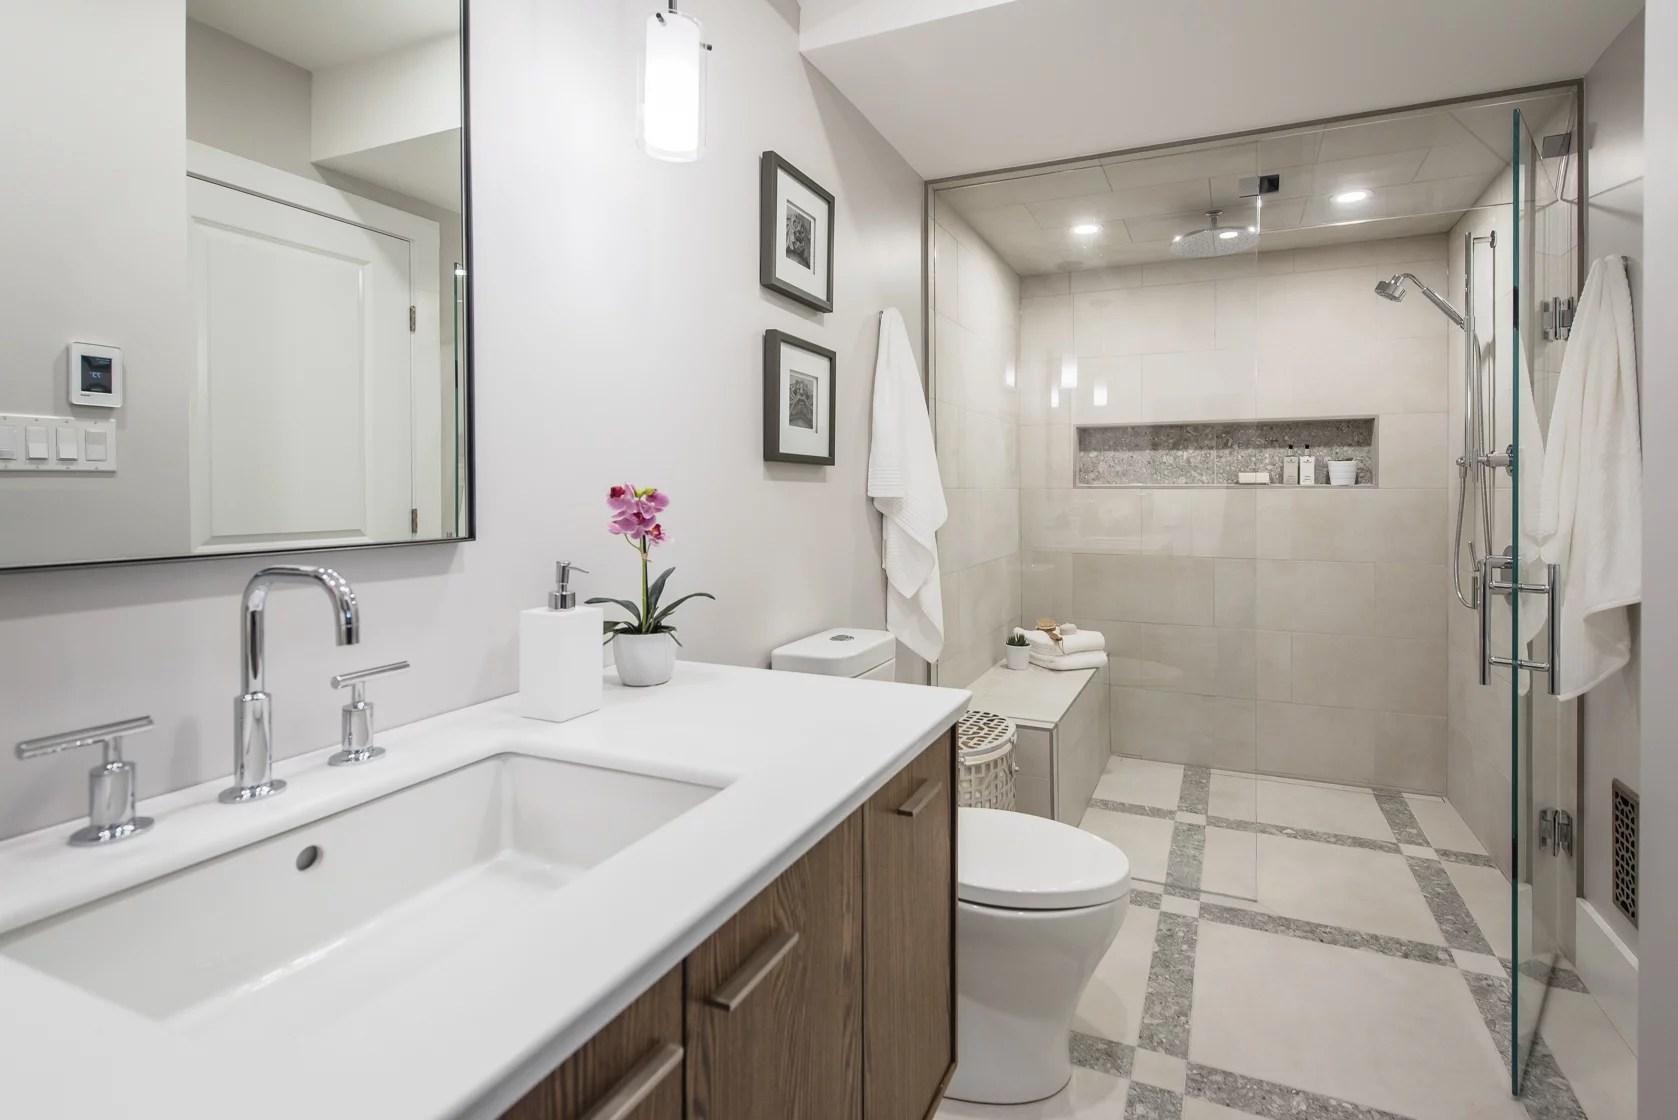 Luxurious Bathroom Updates